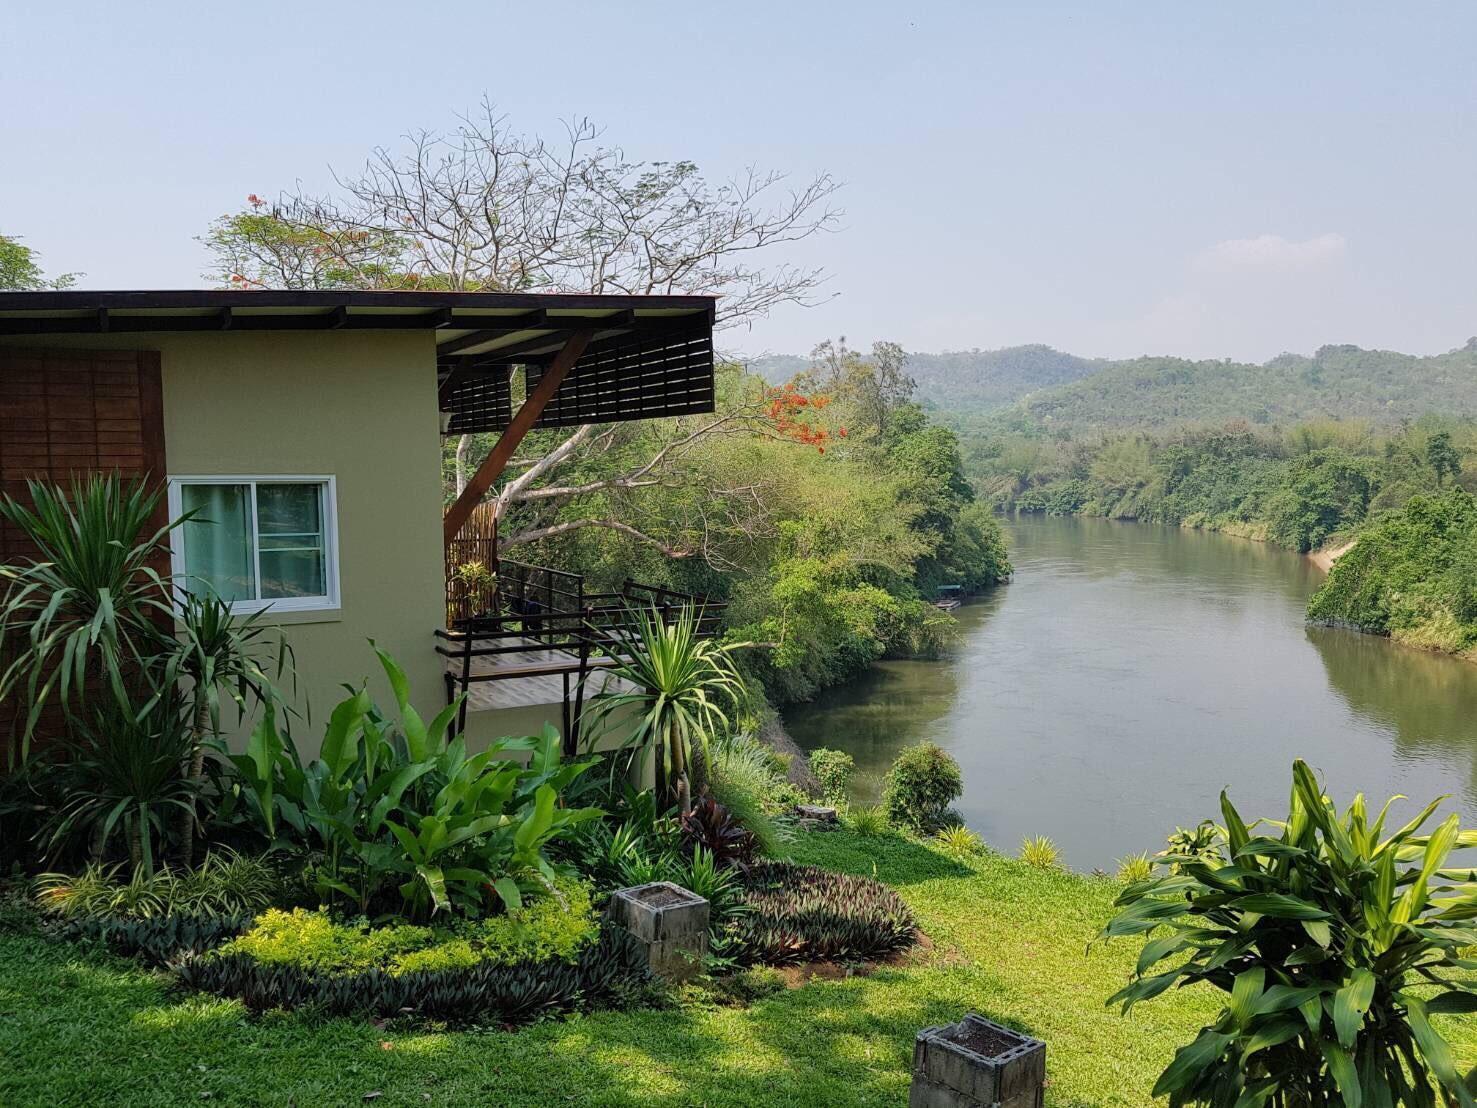 Kwai Noy River Park Resort แควน้อยริเวอร์พาร์ค รีสอร์ท